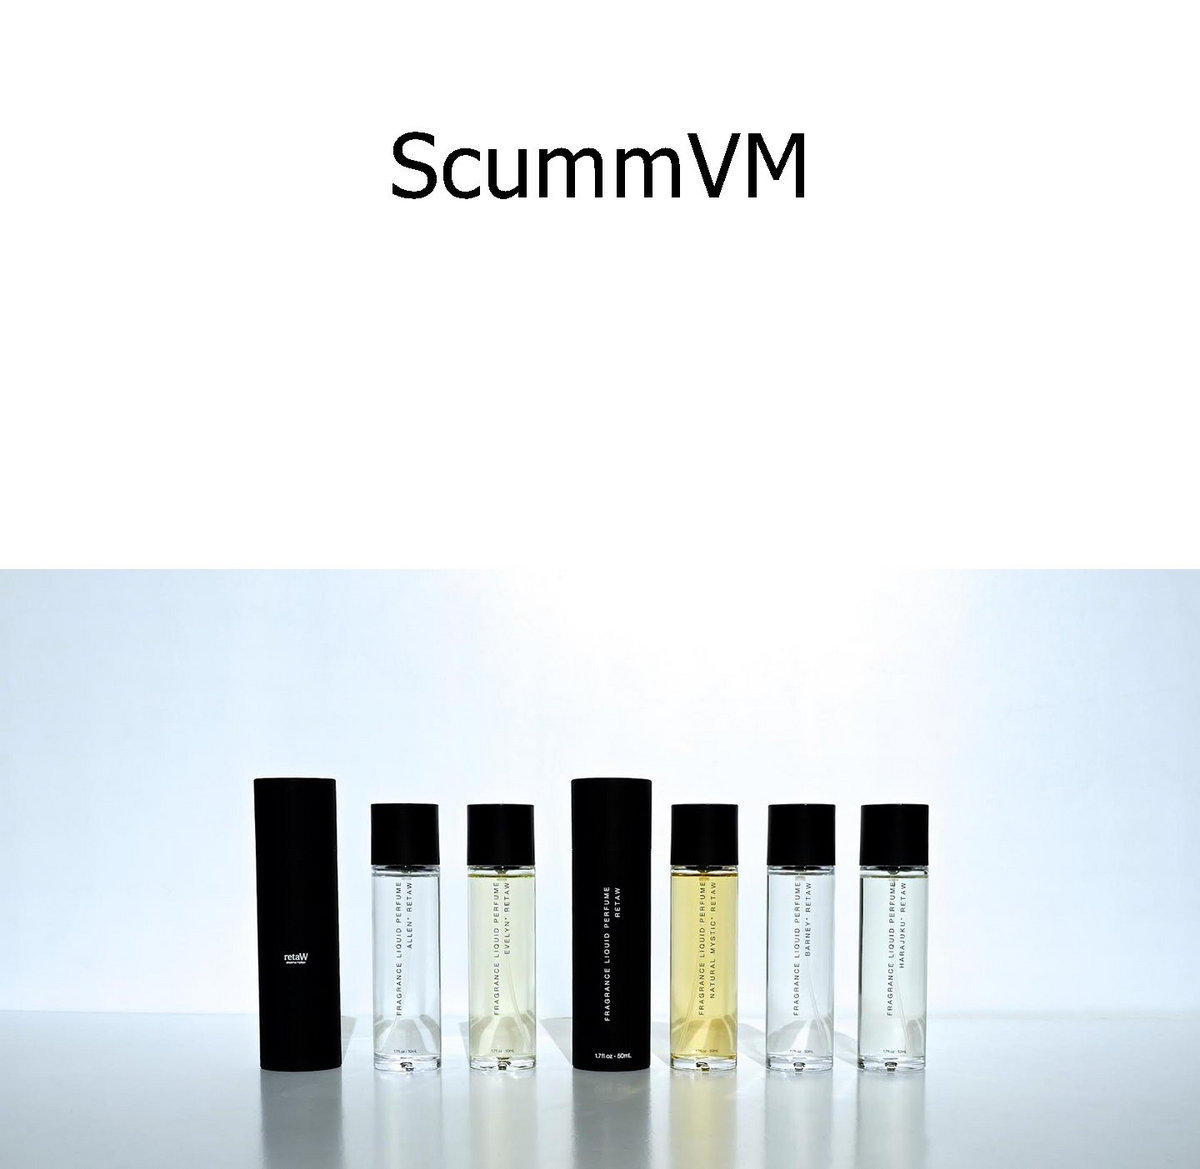 download scummvm